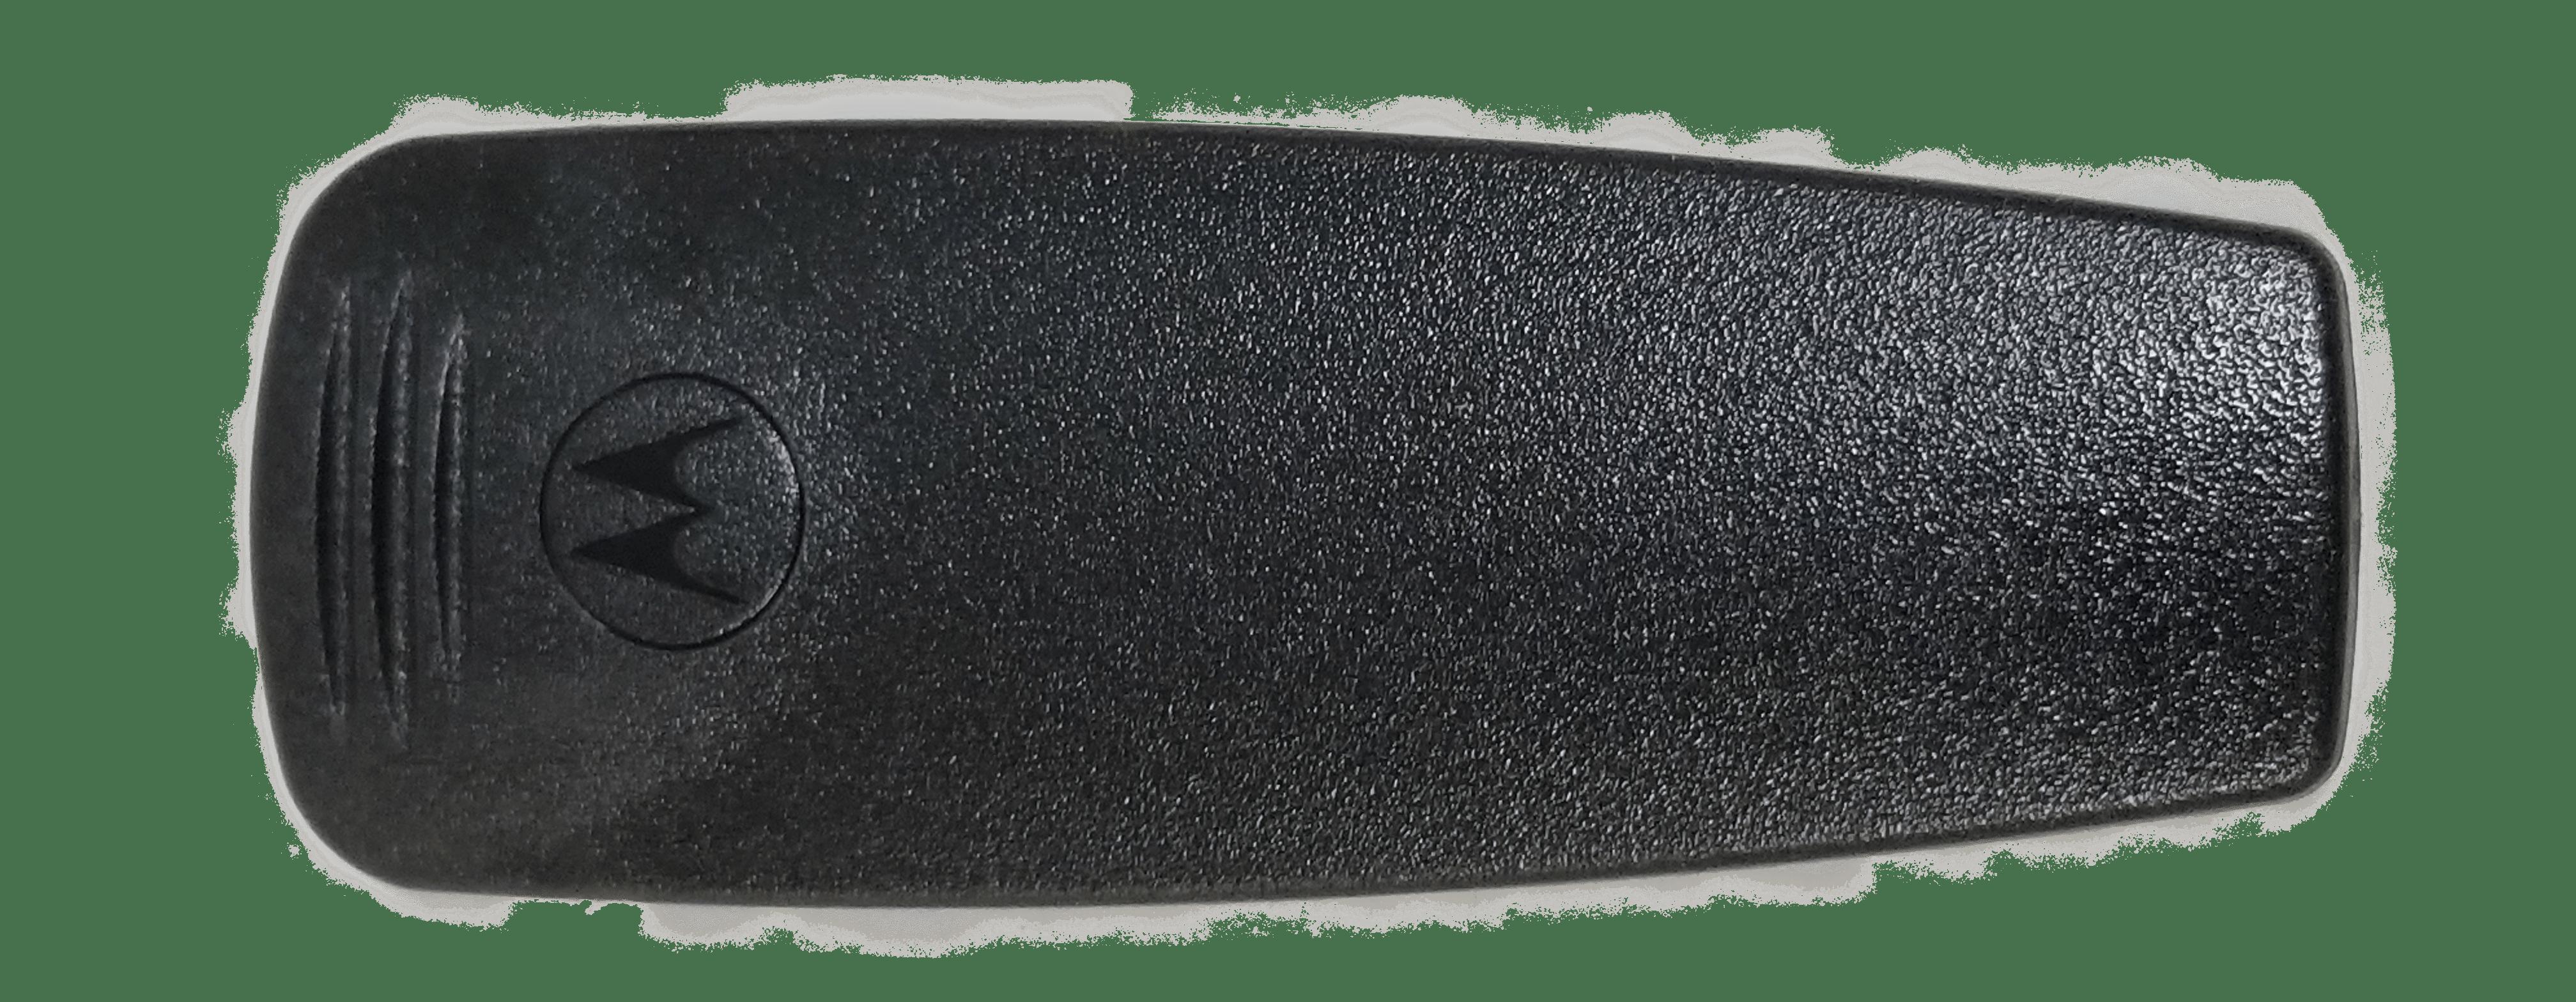 "HLN9714A - Motorola 3"" Spring Belt Clip For AX Series Radios"